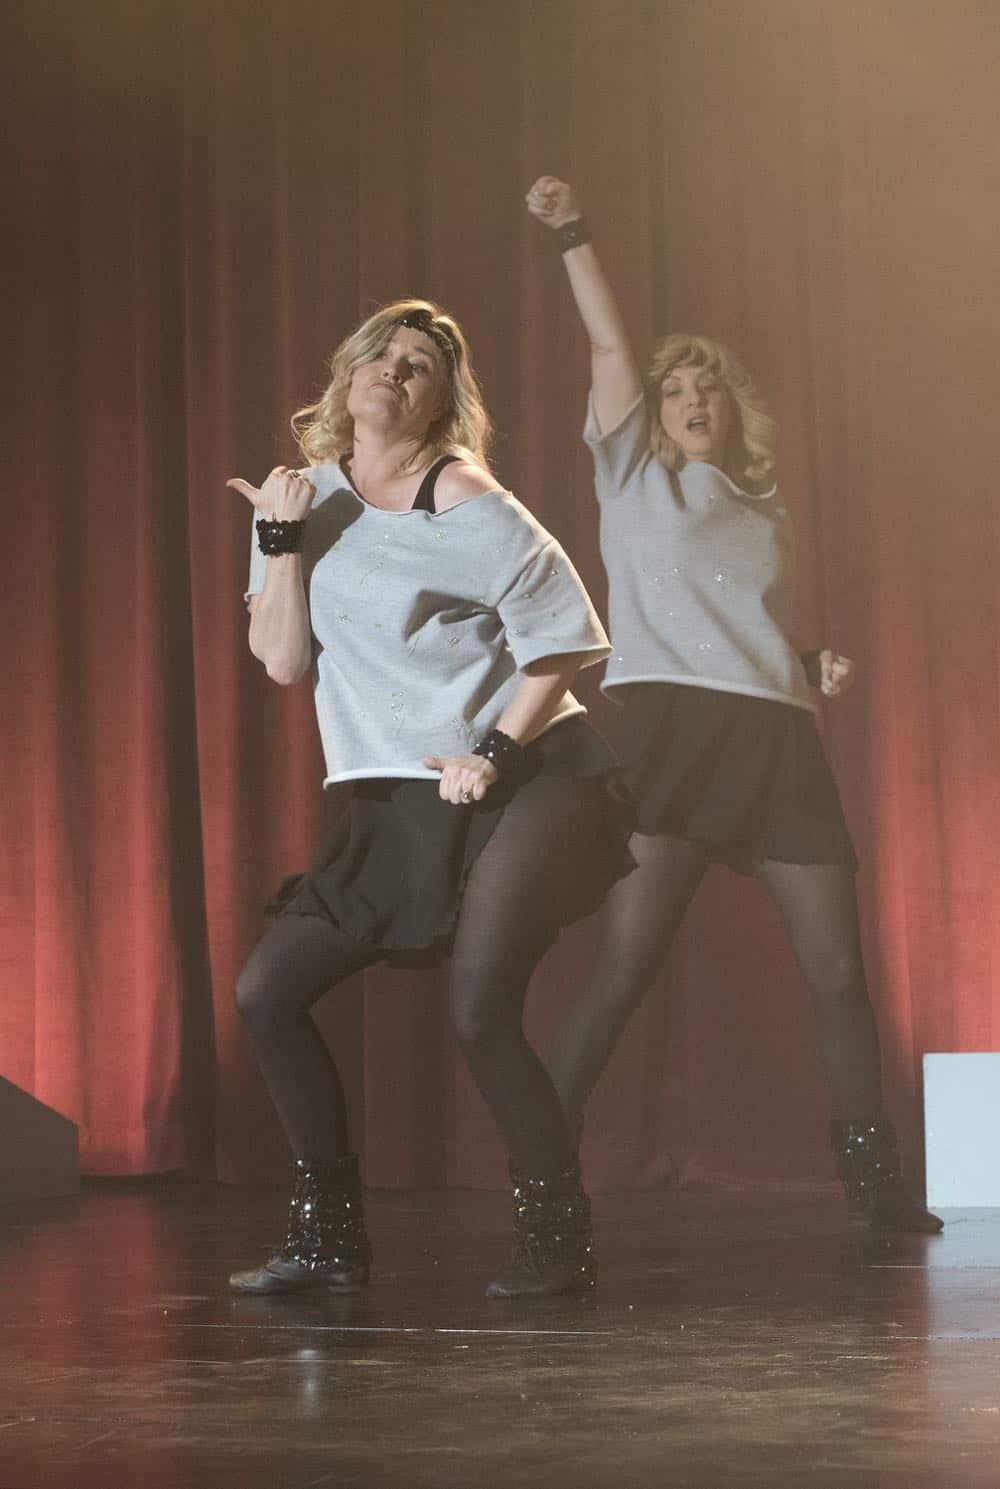 The Goldbergs Episode 19 Season 5 Flashy Little Flashdancer 47